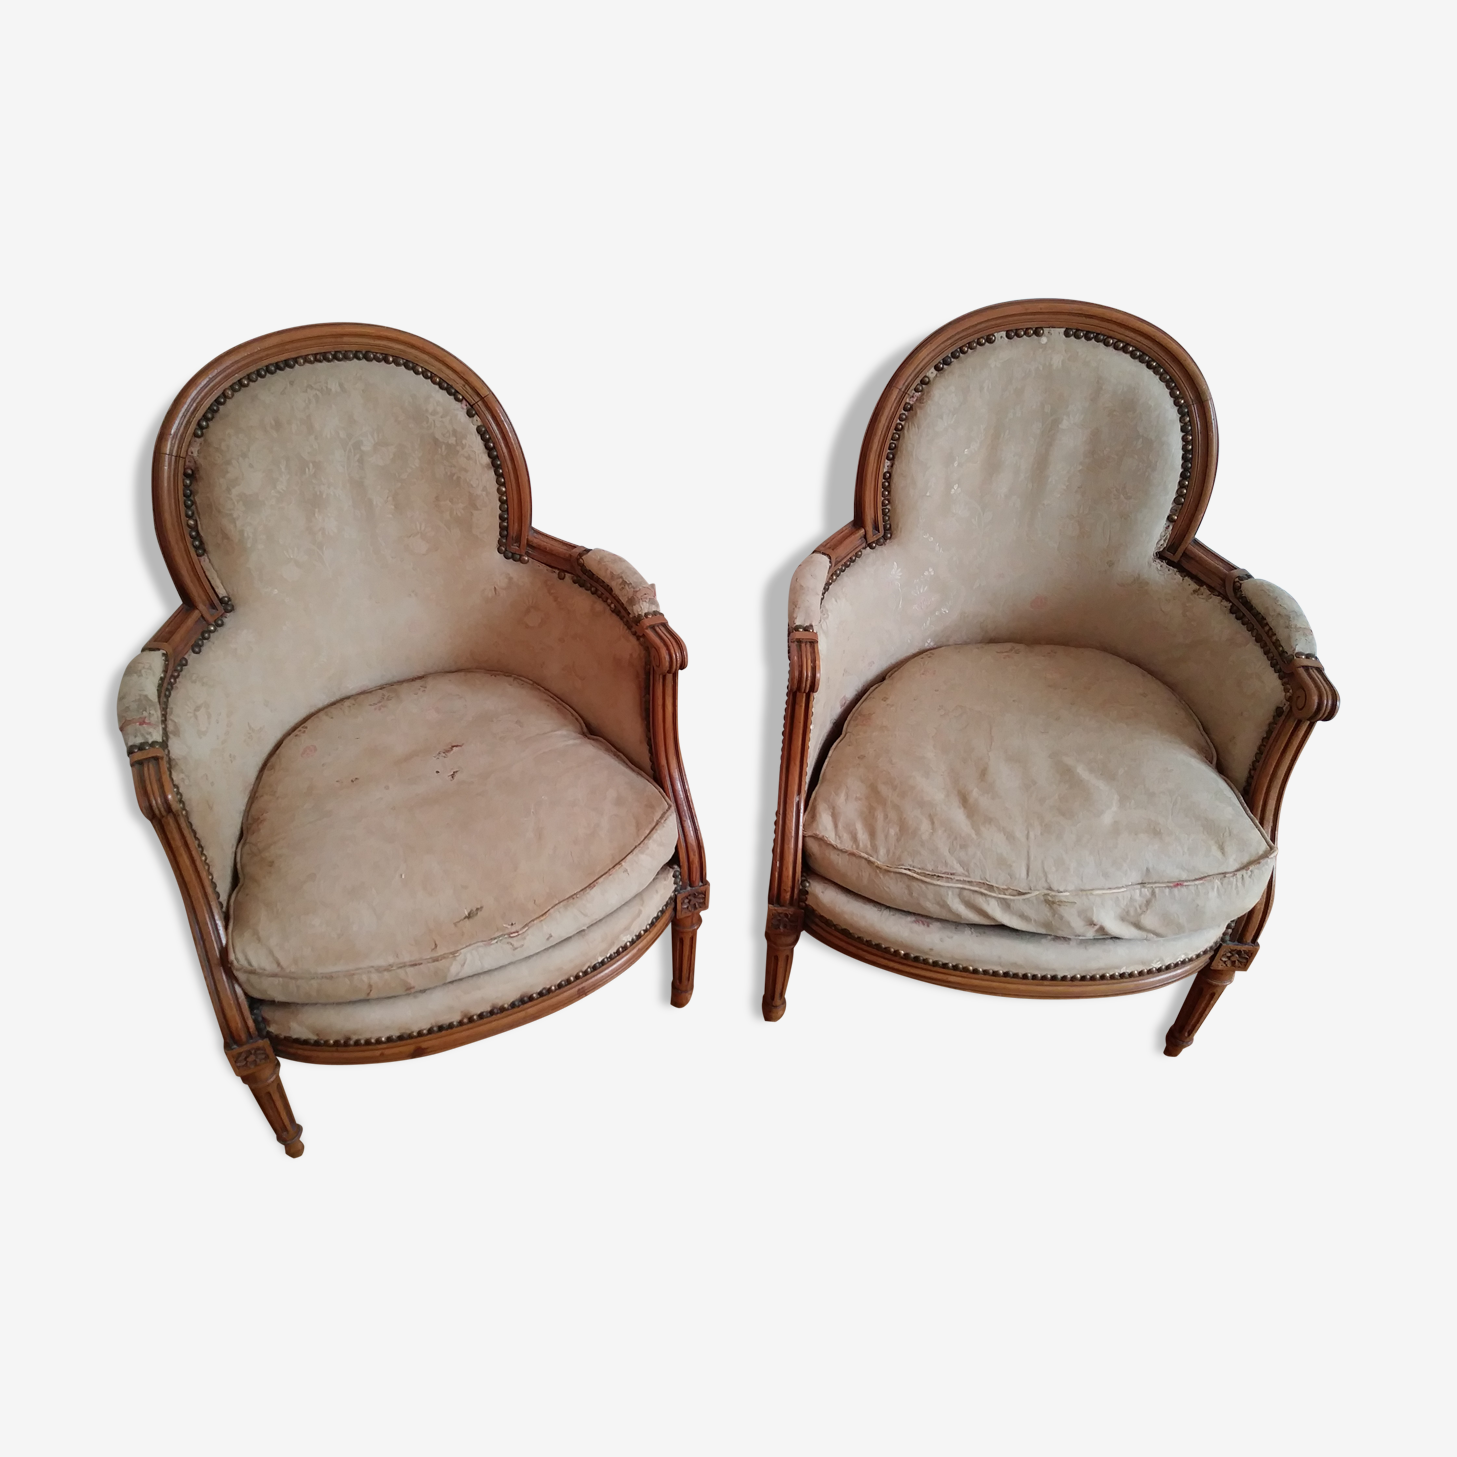 Pair of Louis XVI shepherdesses